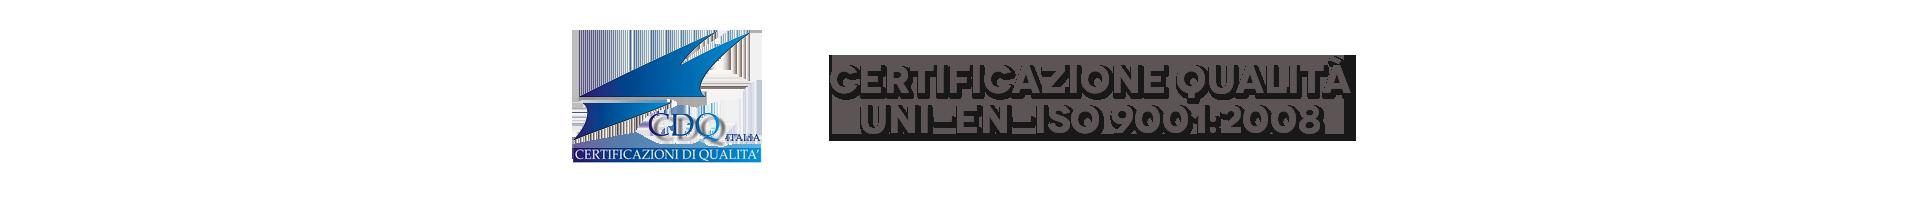 img_home_certificazioni5